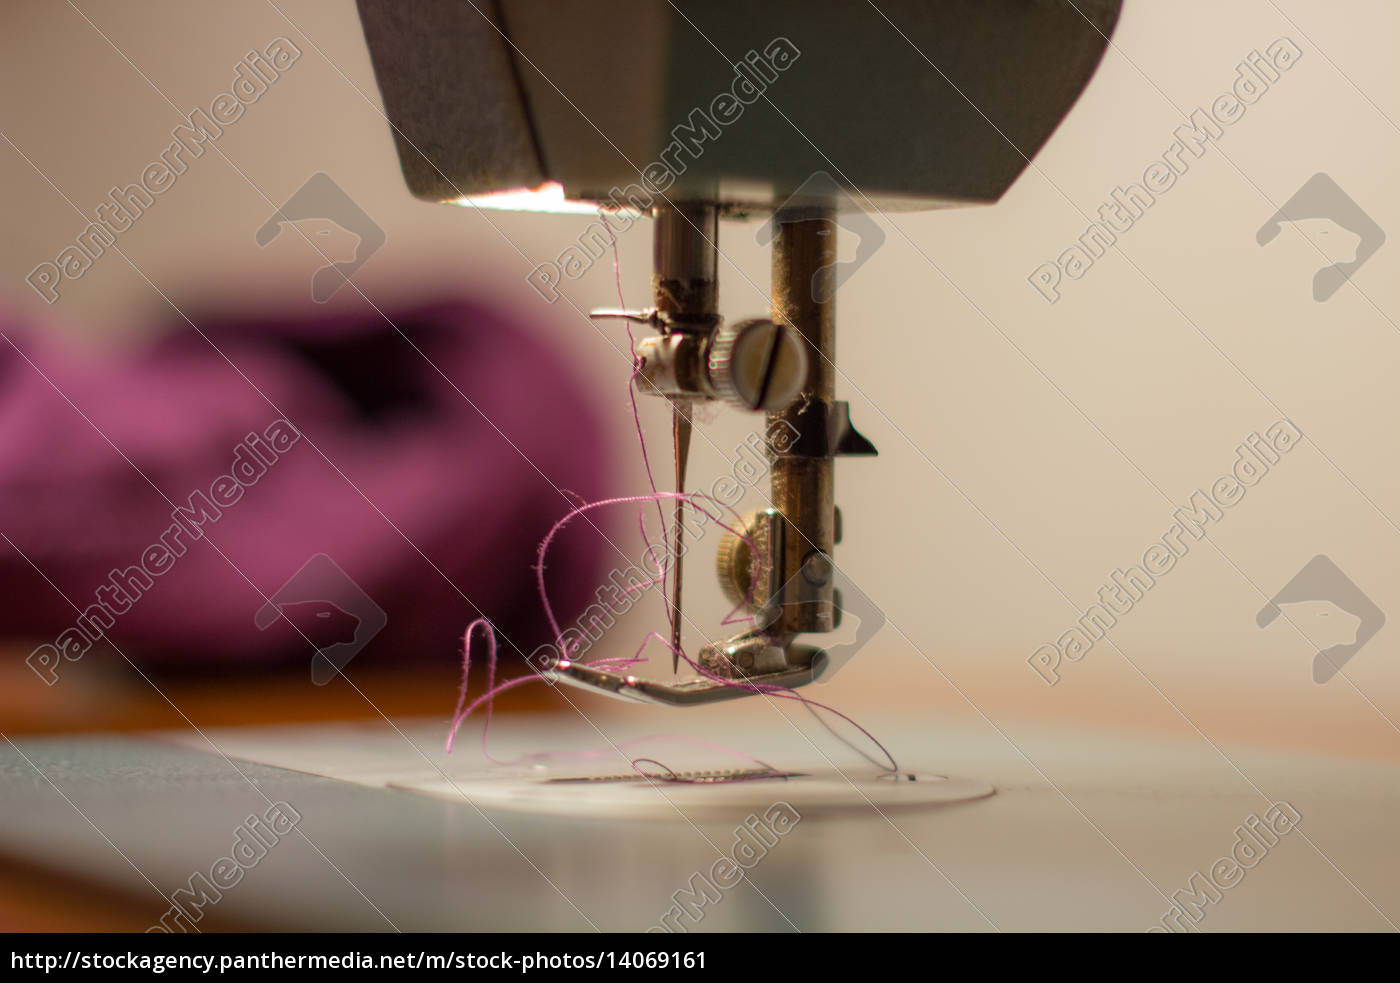 sewing, machine - 14069161